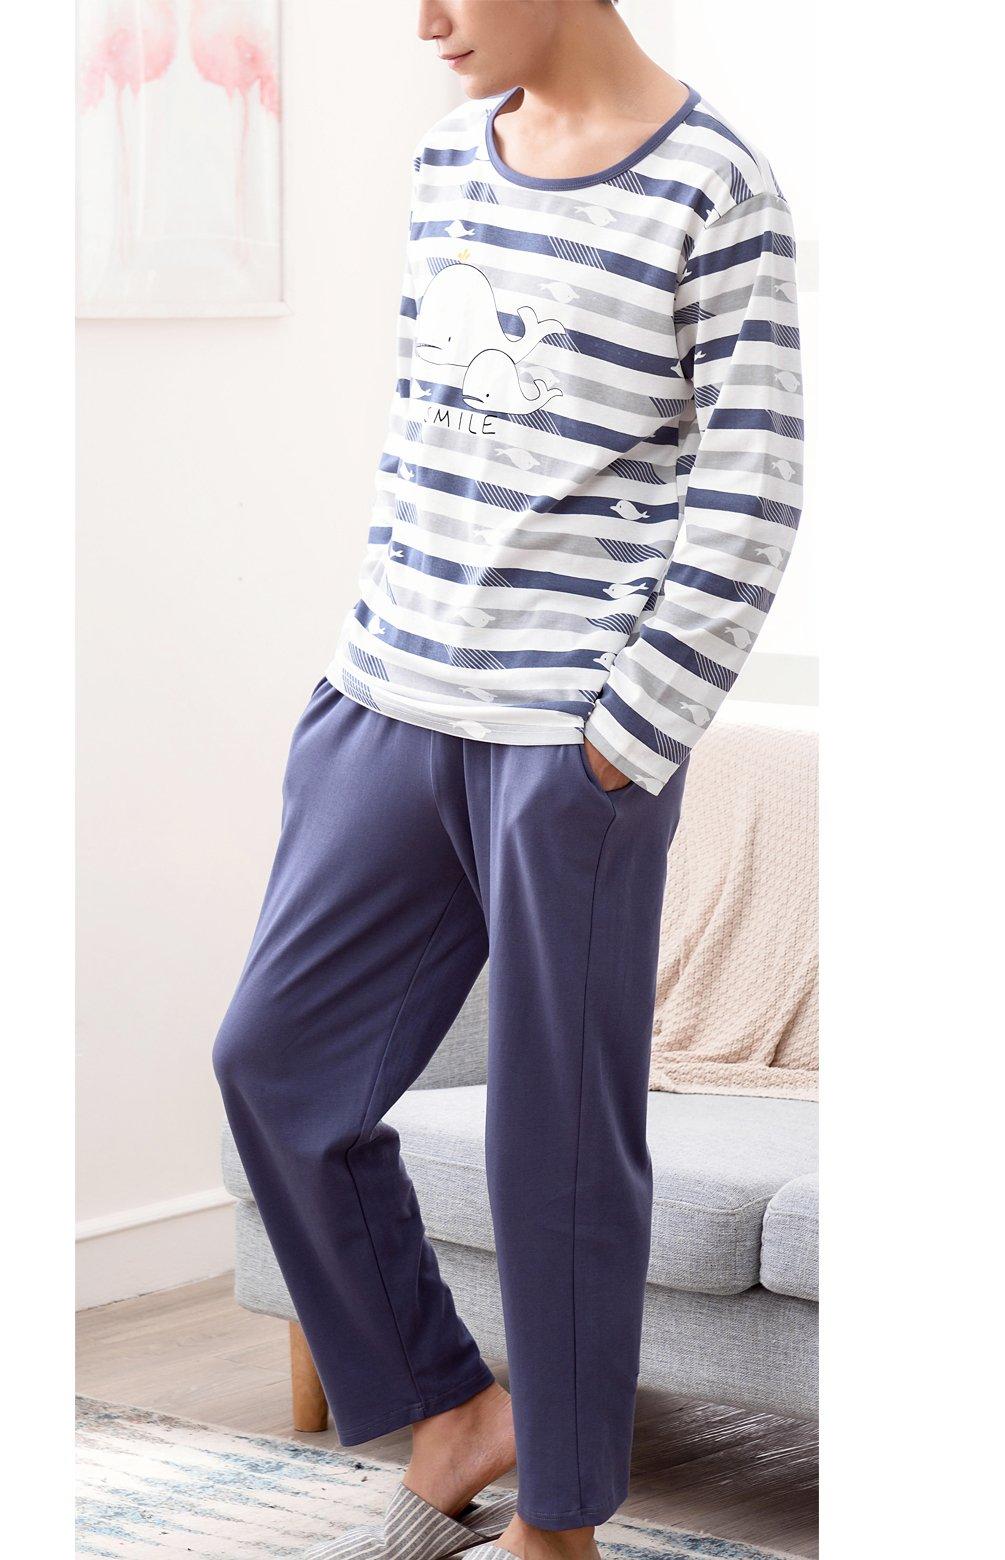 BYX SweetLeisure Big Boys Loose Cute Cotton Pajamas Leisure Wear 10-16 Years by BYX SweetLeisure (Image #2)